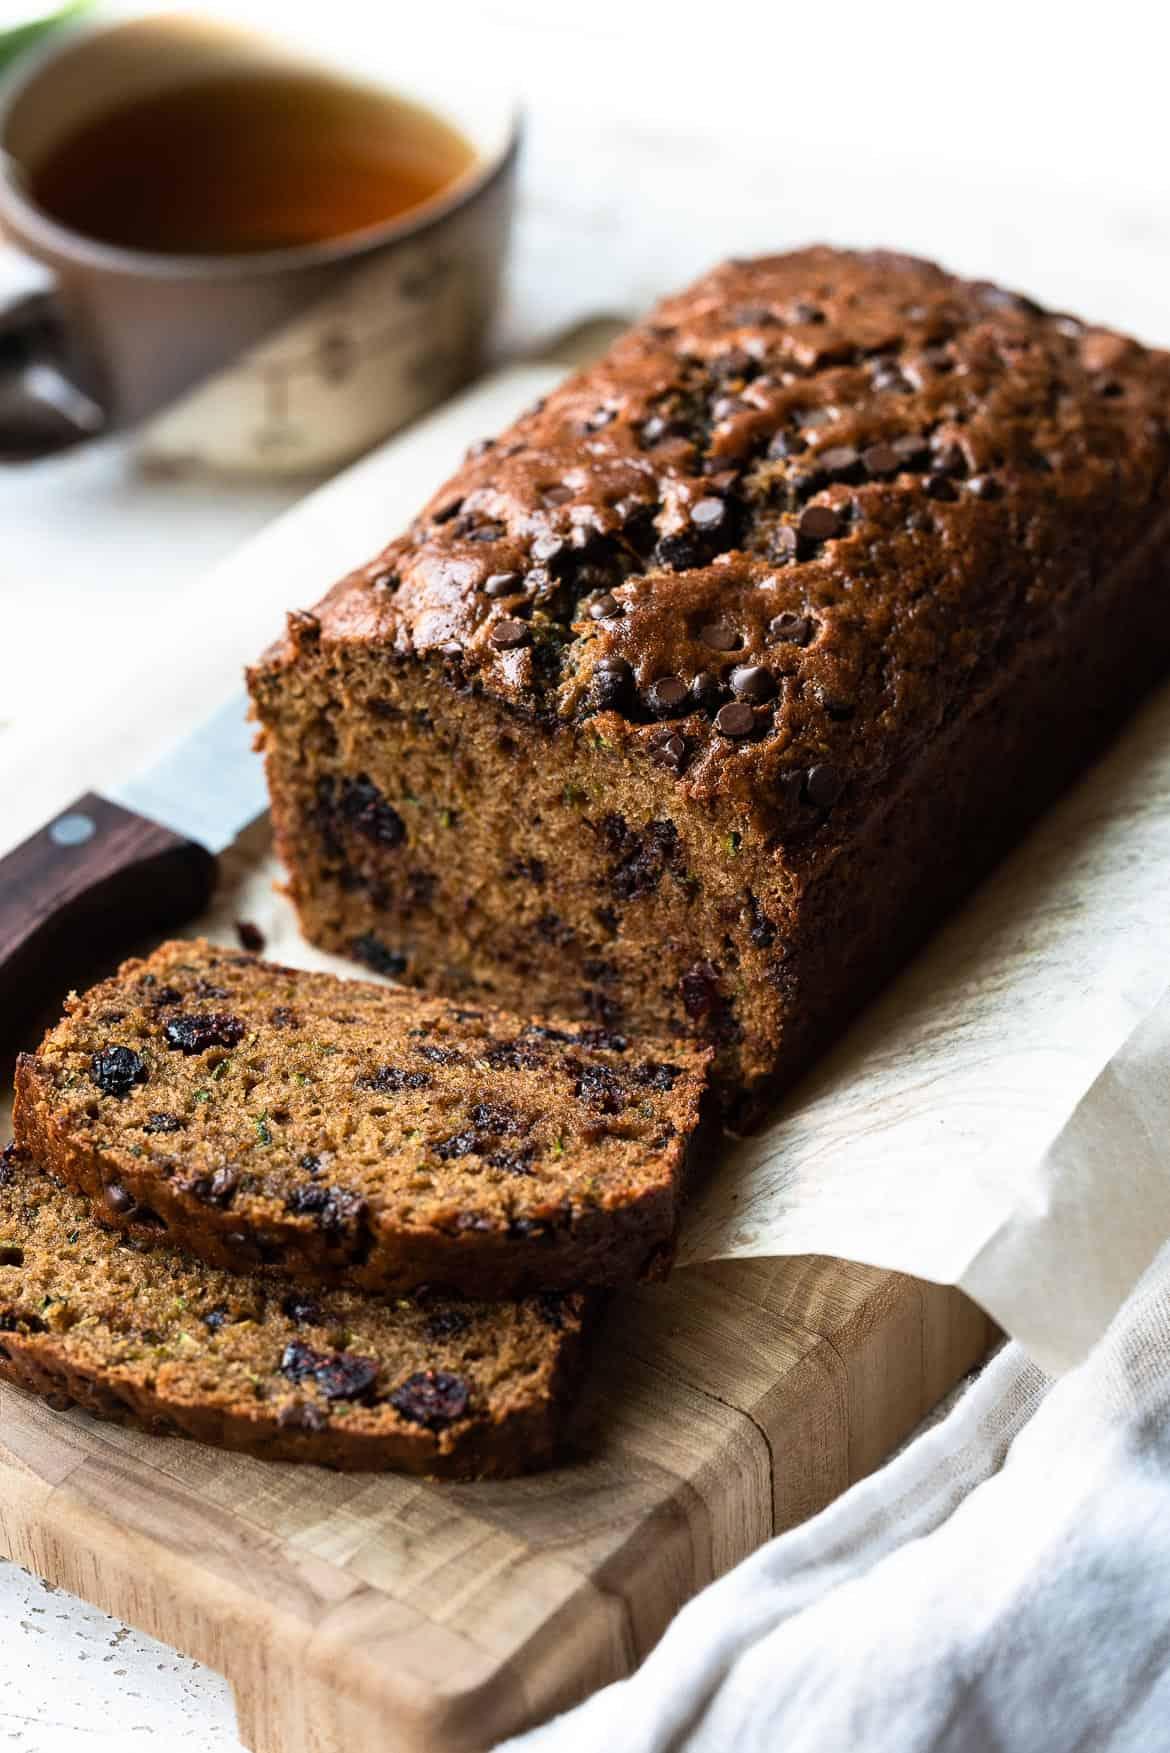 Zucchini bread / cake